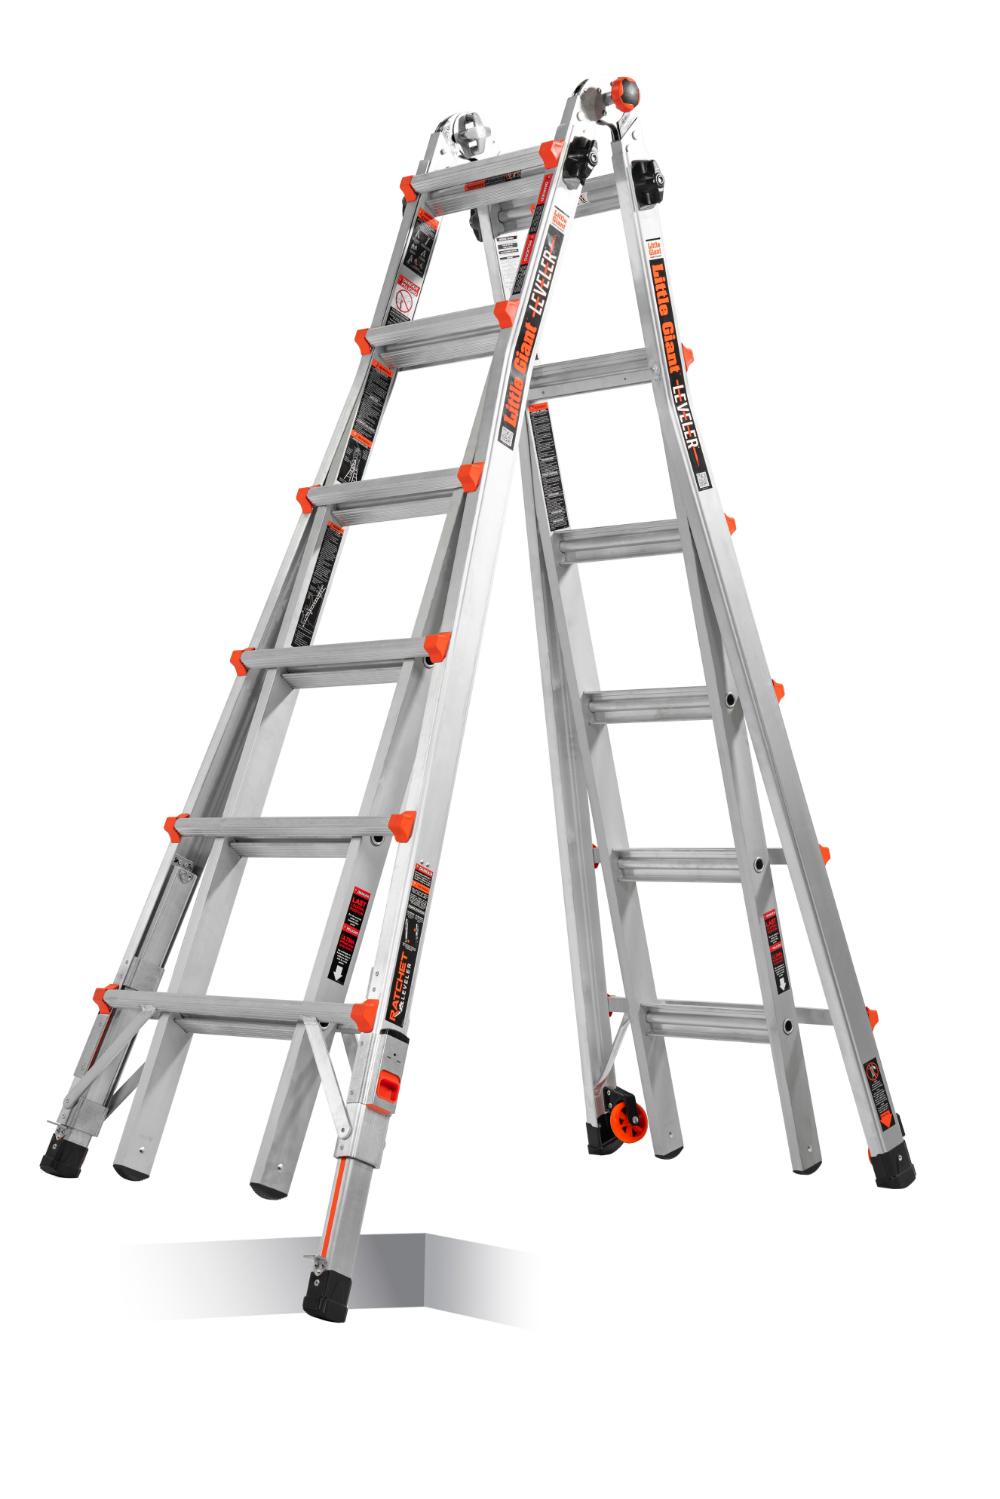 Little Giant Ladders Leveler Aluminum 26 Ft Reach Type 1a 300 Lbs Capacity Telescoping Multi Position Ladder Lowes Com Multi Purpose Ladder Ladder Ladder Leveler